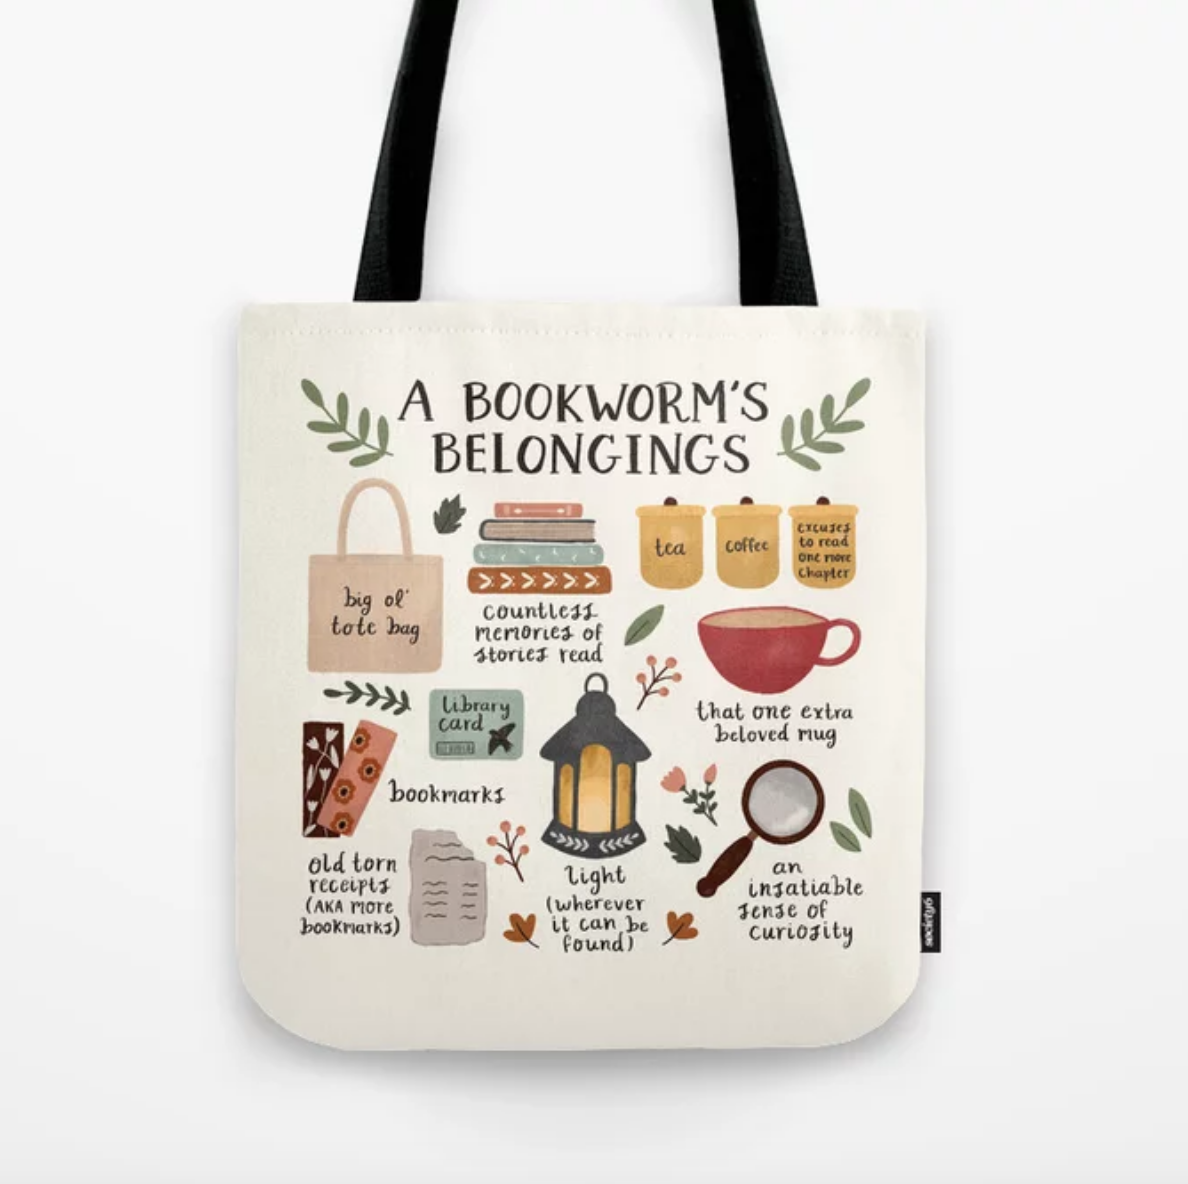 A bookworm's belongings tote bag